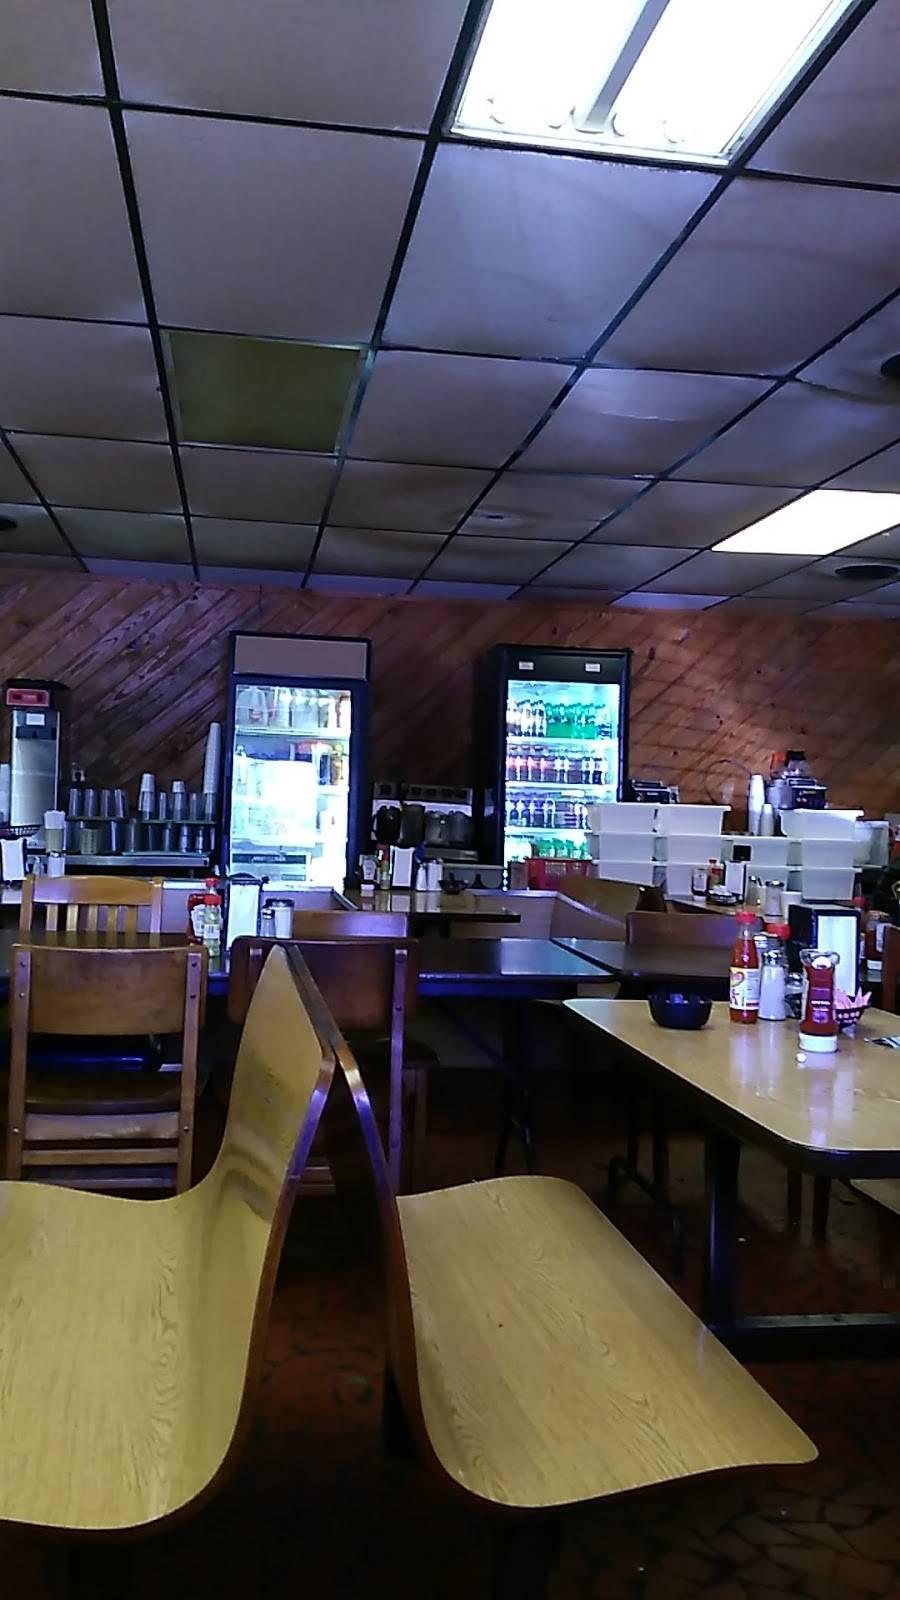 Pappys Restaurant LLC | restaurant | 5804 Carolyn St, Hanahan, SC 29410, USA | 8435547447 OR +1 843-554-7447